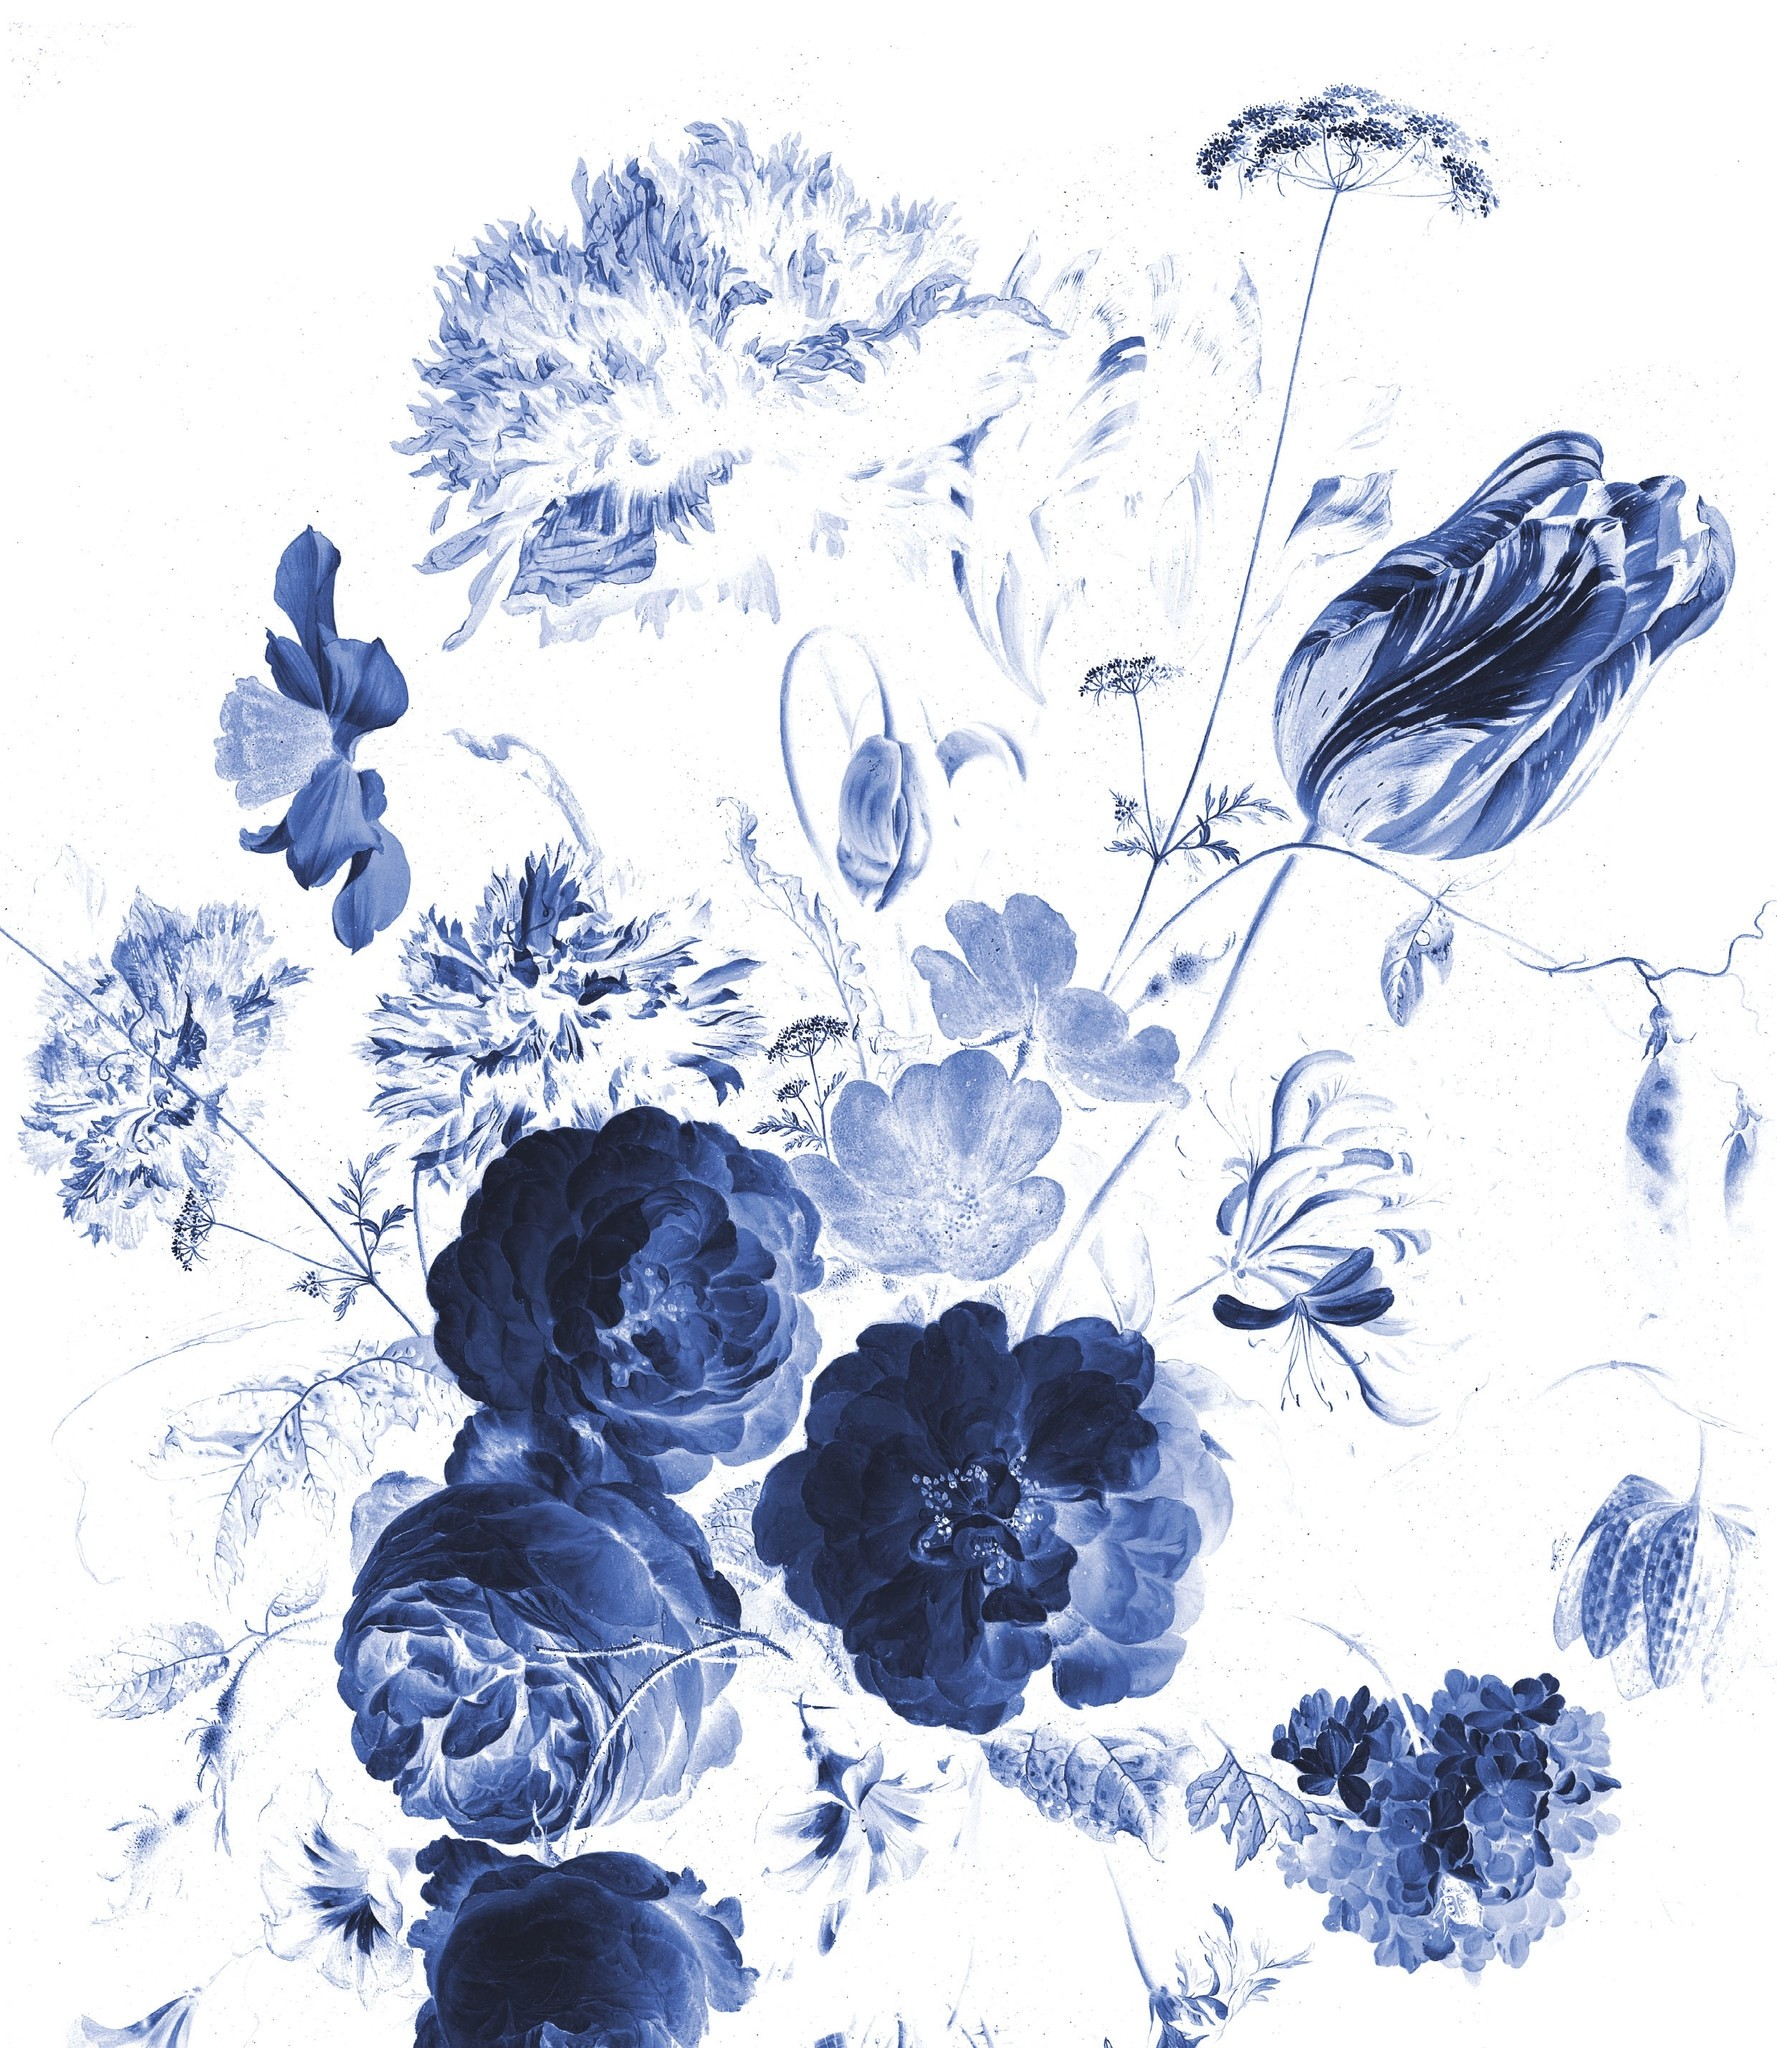 KEK Wallpaper Panel XL, Royal Blue Flowers, 190x220cm-8719743888814-323